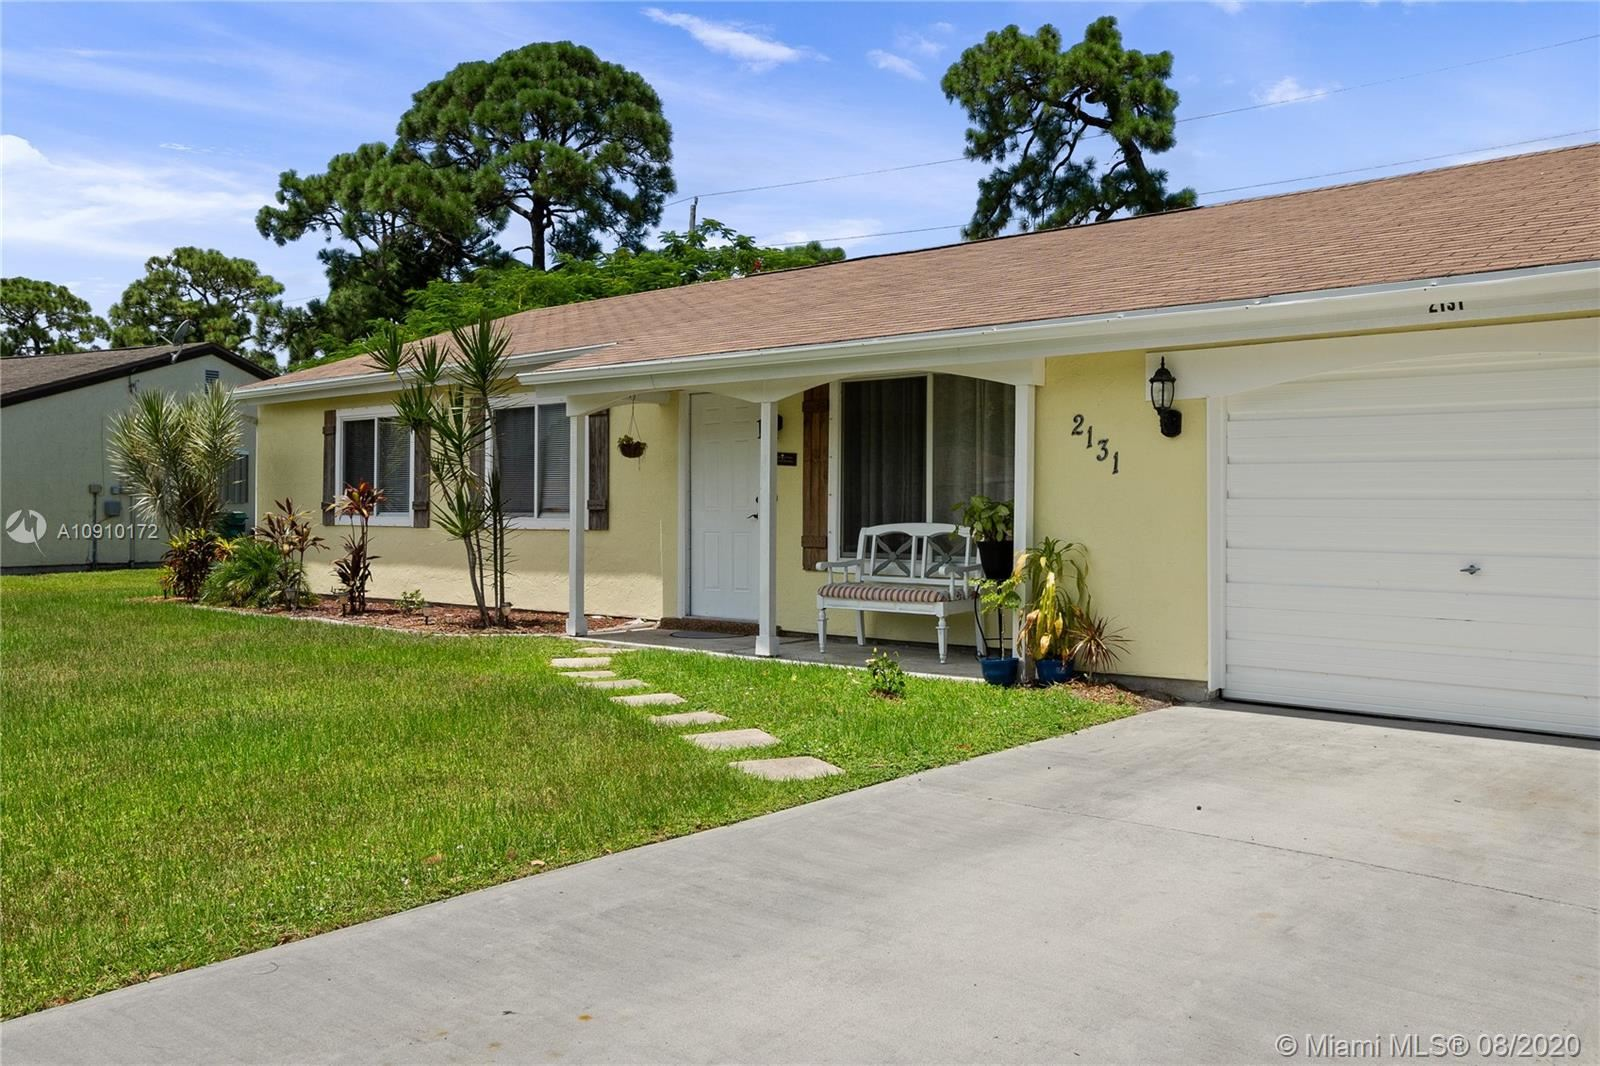 2131 SE Flagstone Ct, Port Saint Lucie, FL 34952 - #: A10910172